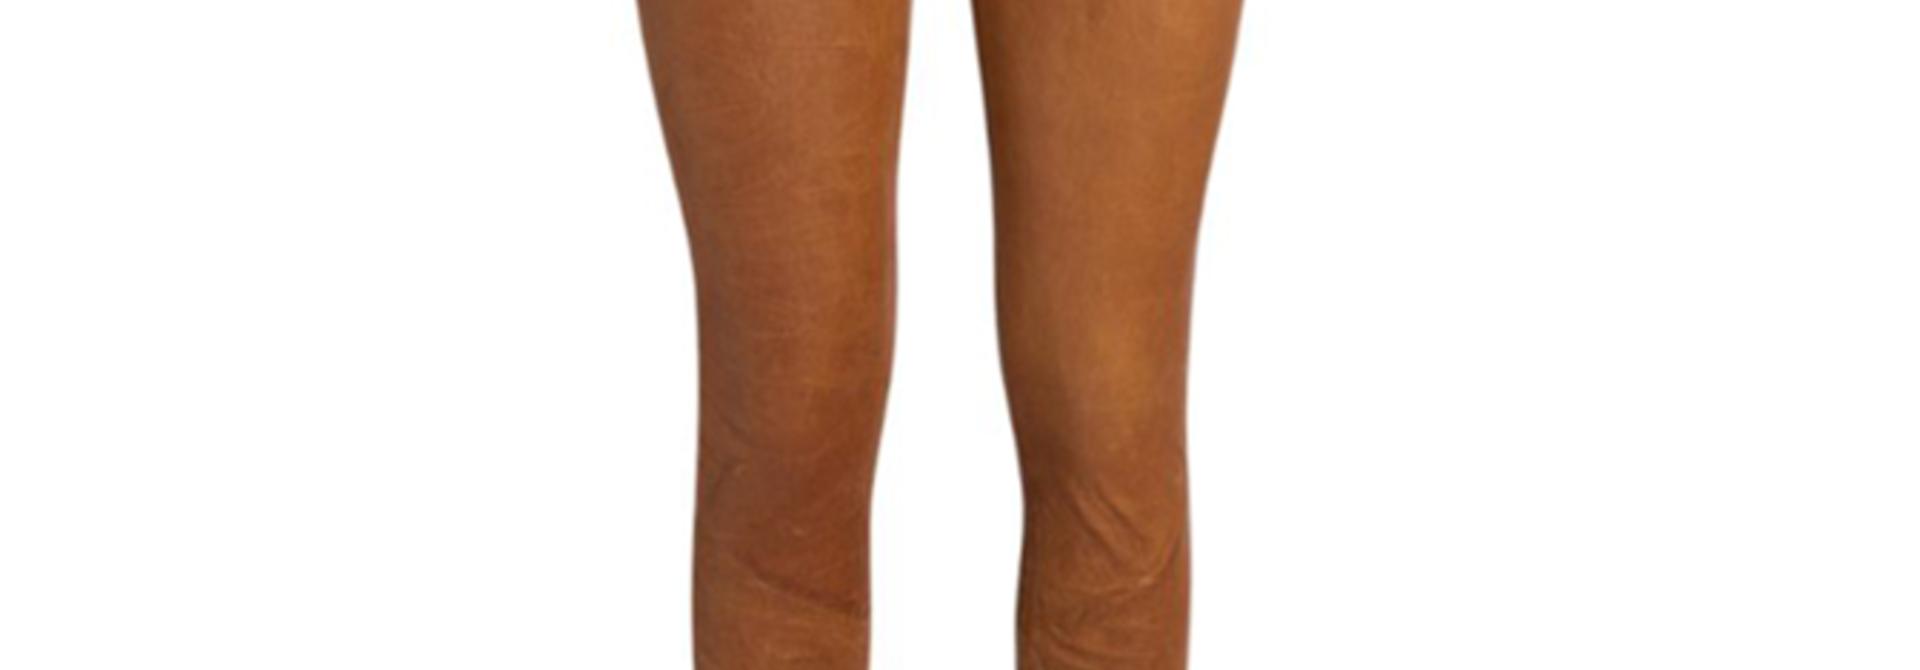 Paige Hoxton ultra skinny 33339A-8679 Dark argan